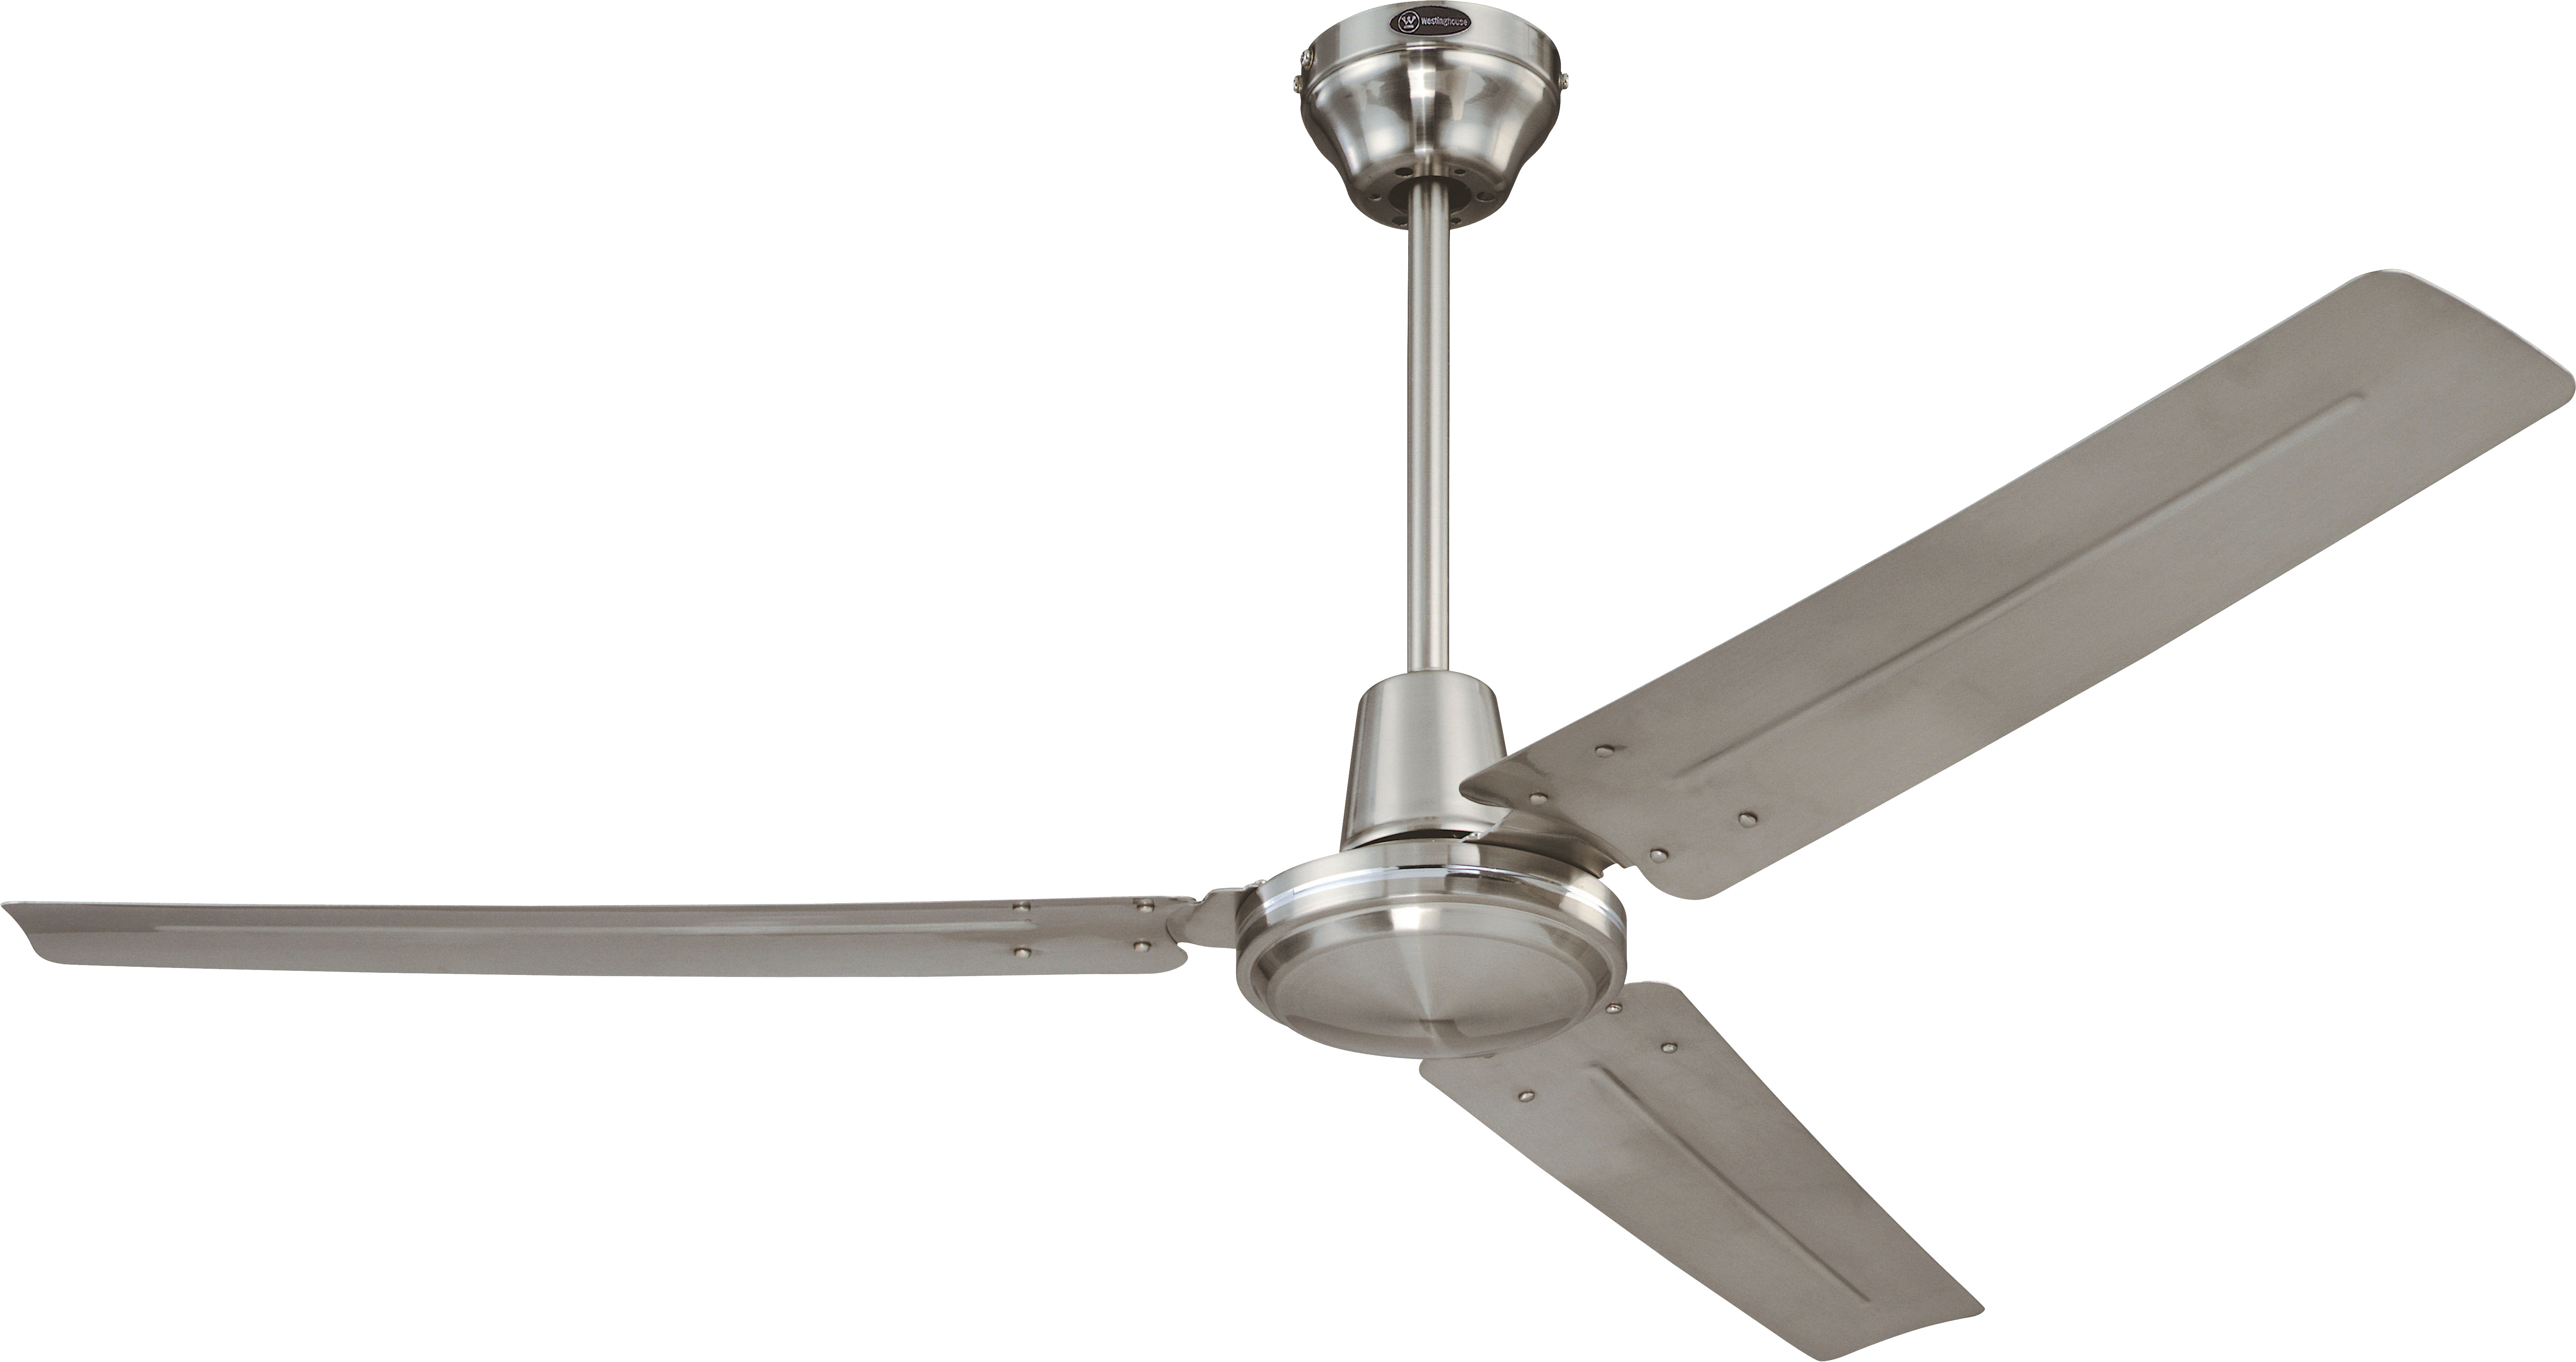 westinghouse ceiling fan light photo - 1